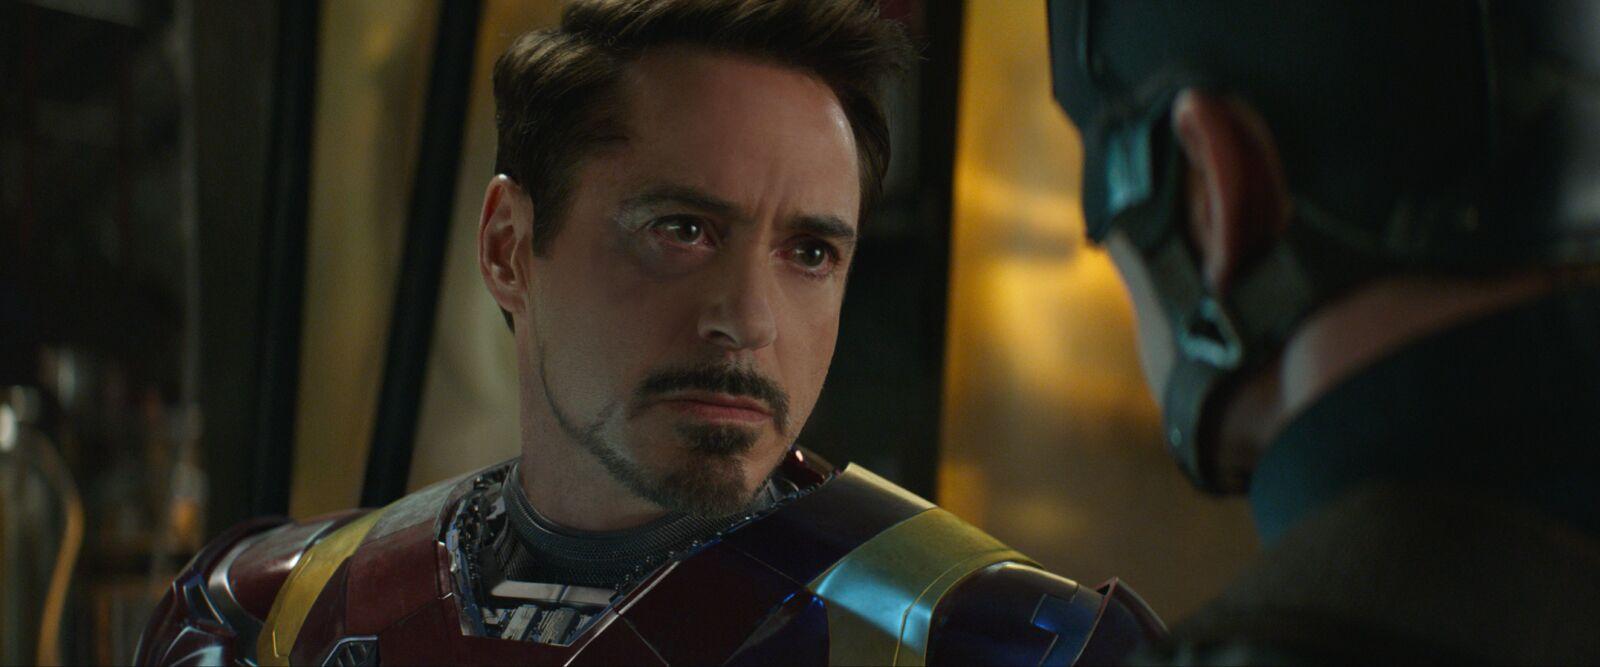 Robert Downey Jr. will reportedly appear in Black Widow